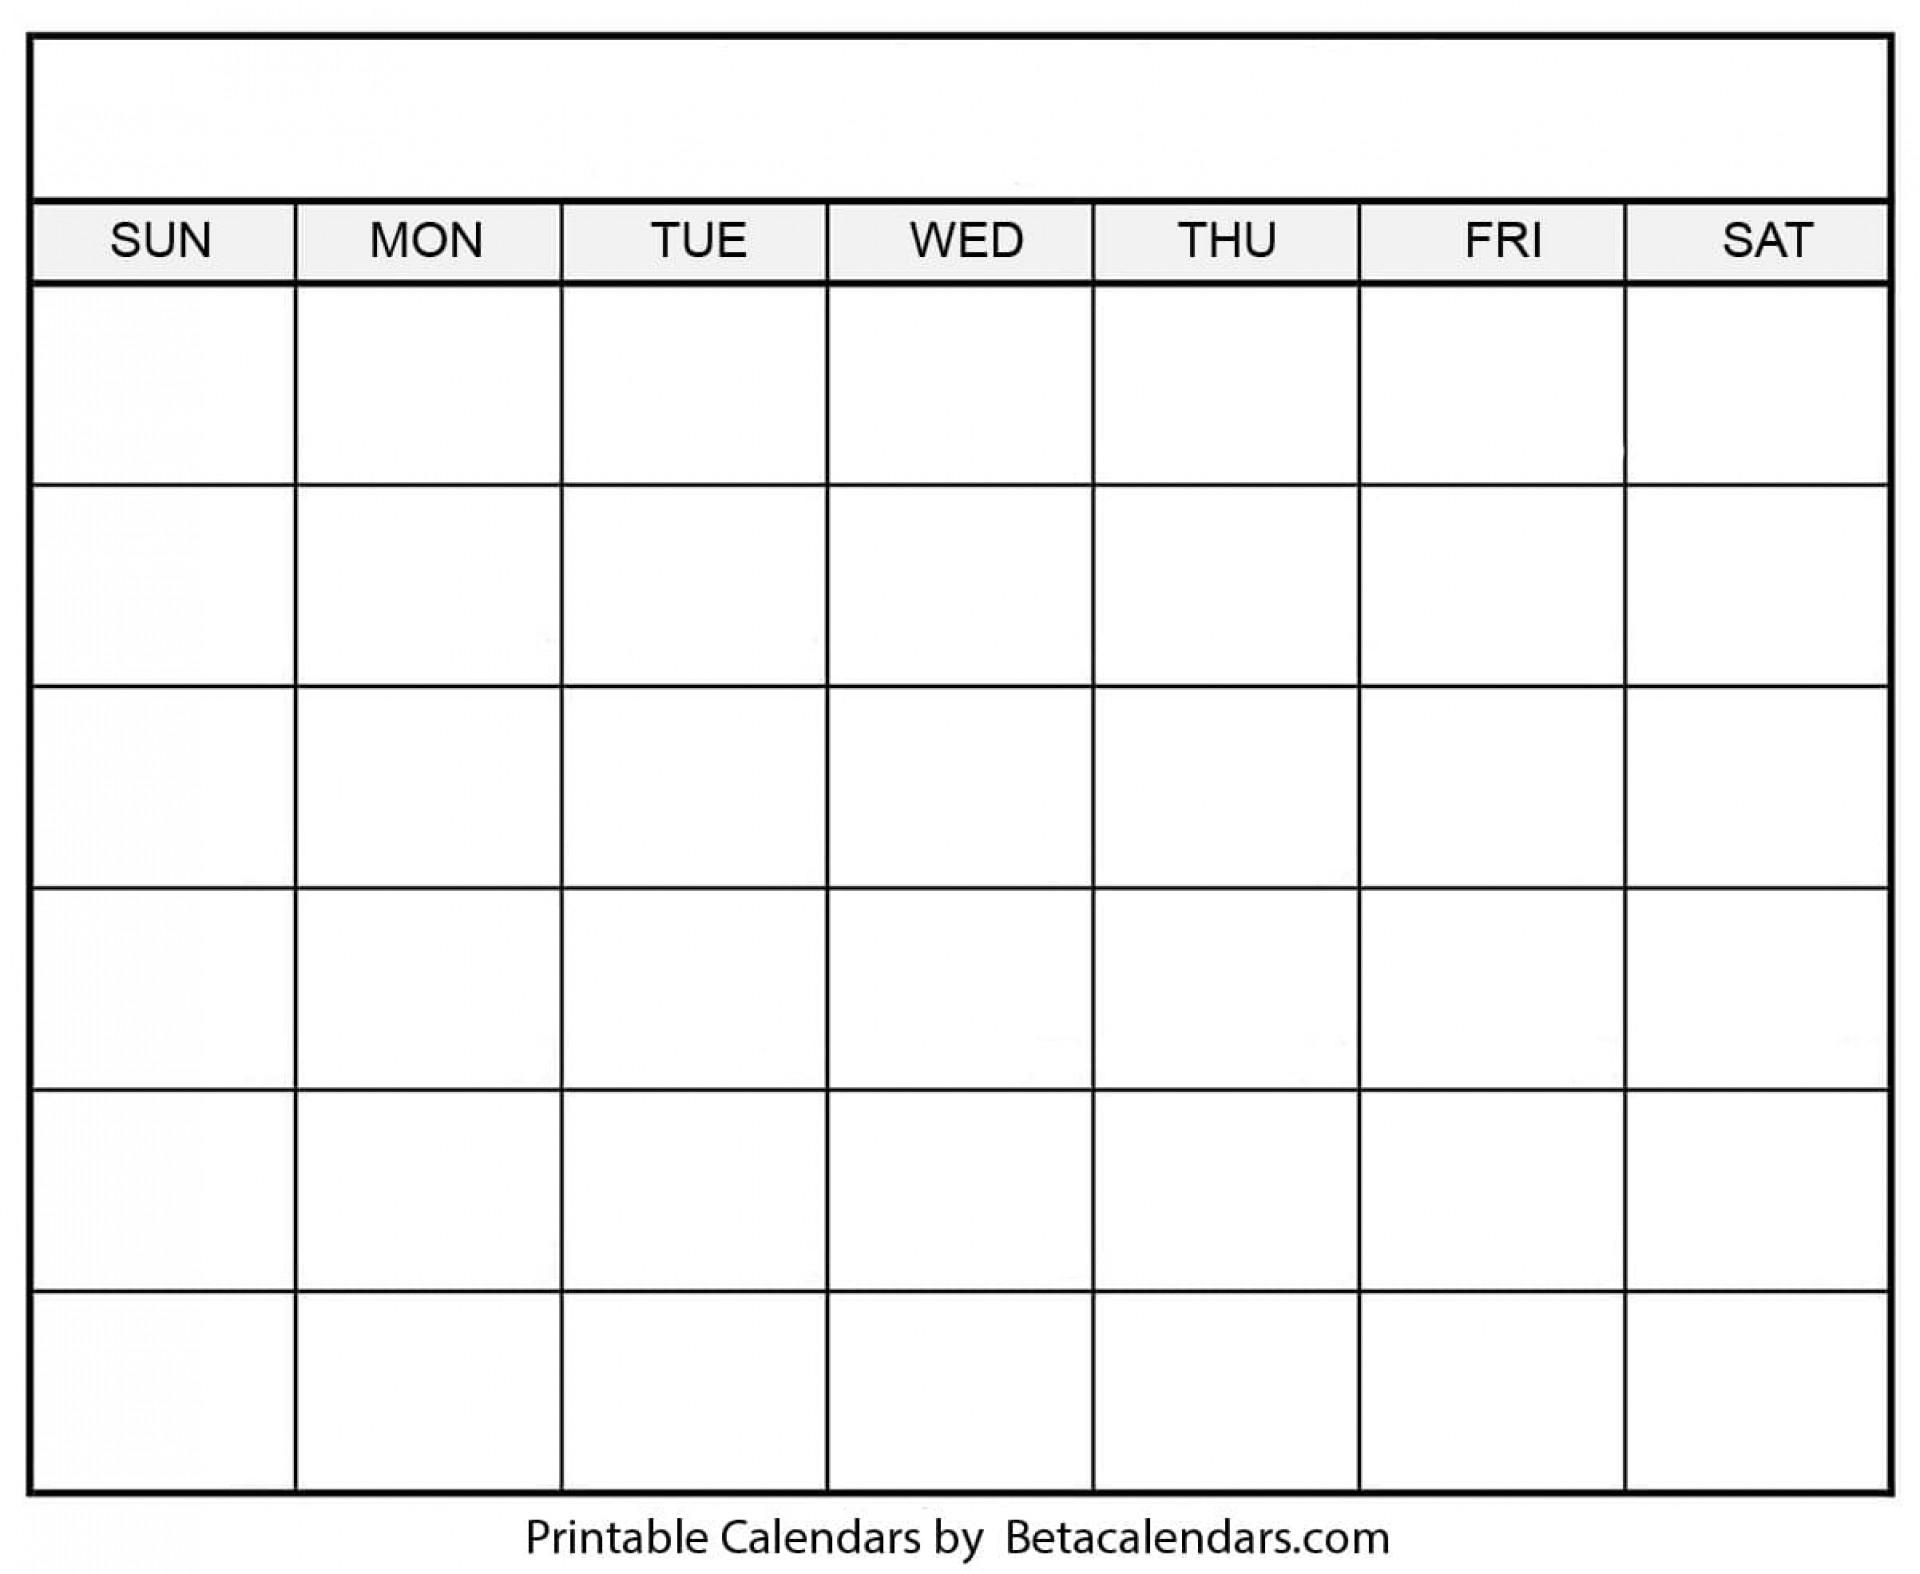 006 Amazing 30 Day Calendar Template Highest Quality  Pdf Free Blank1920